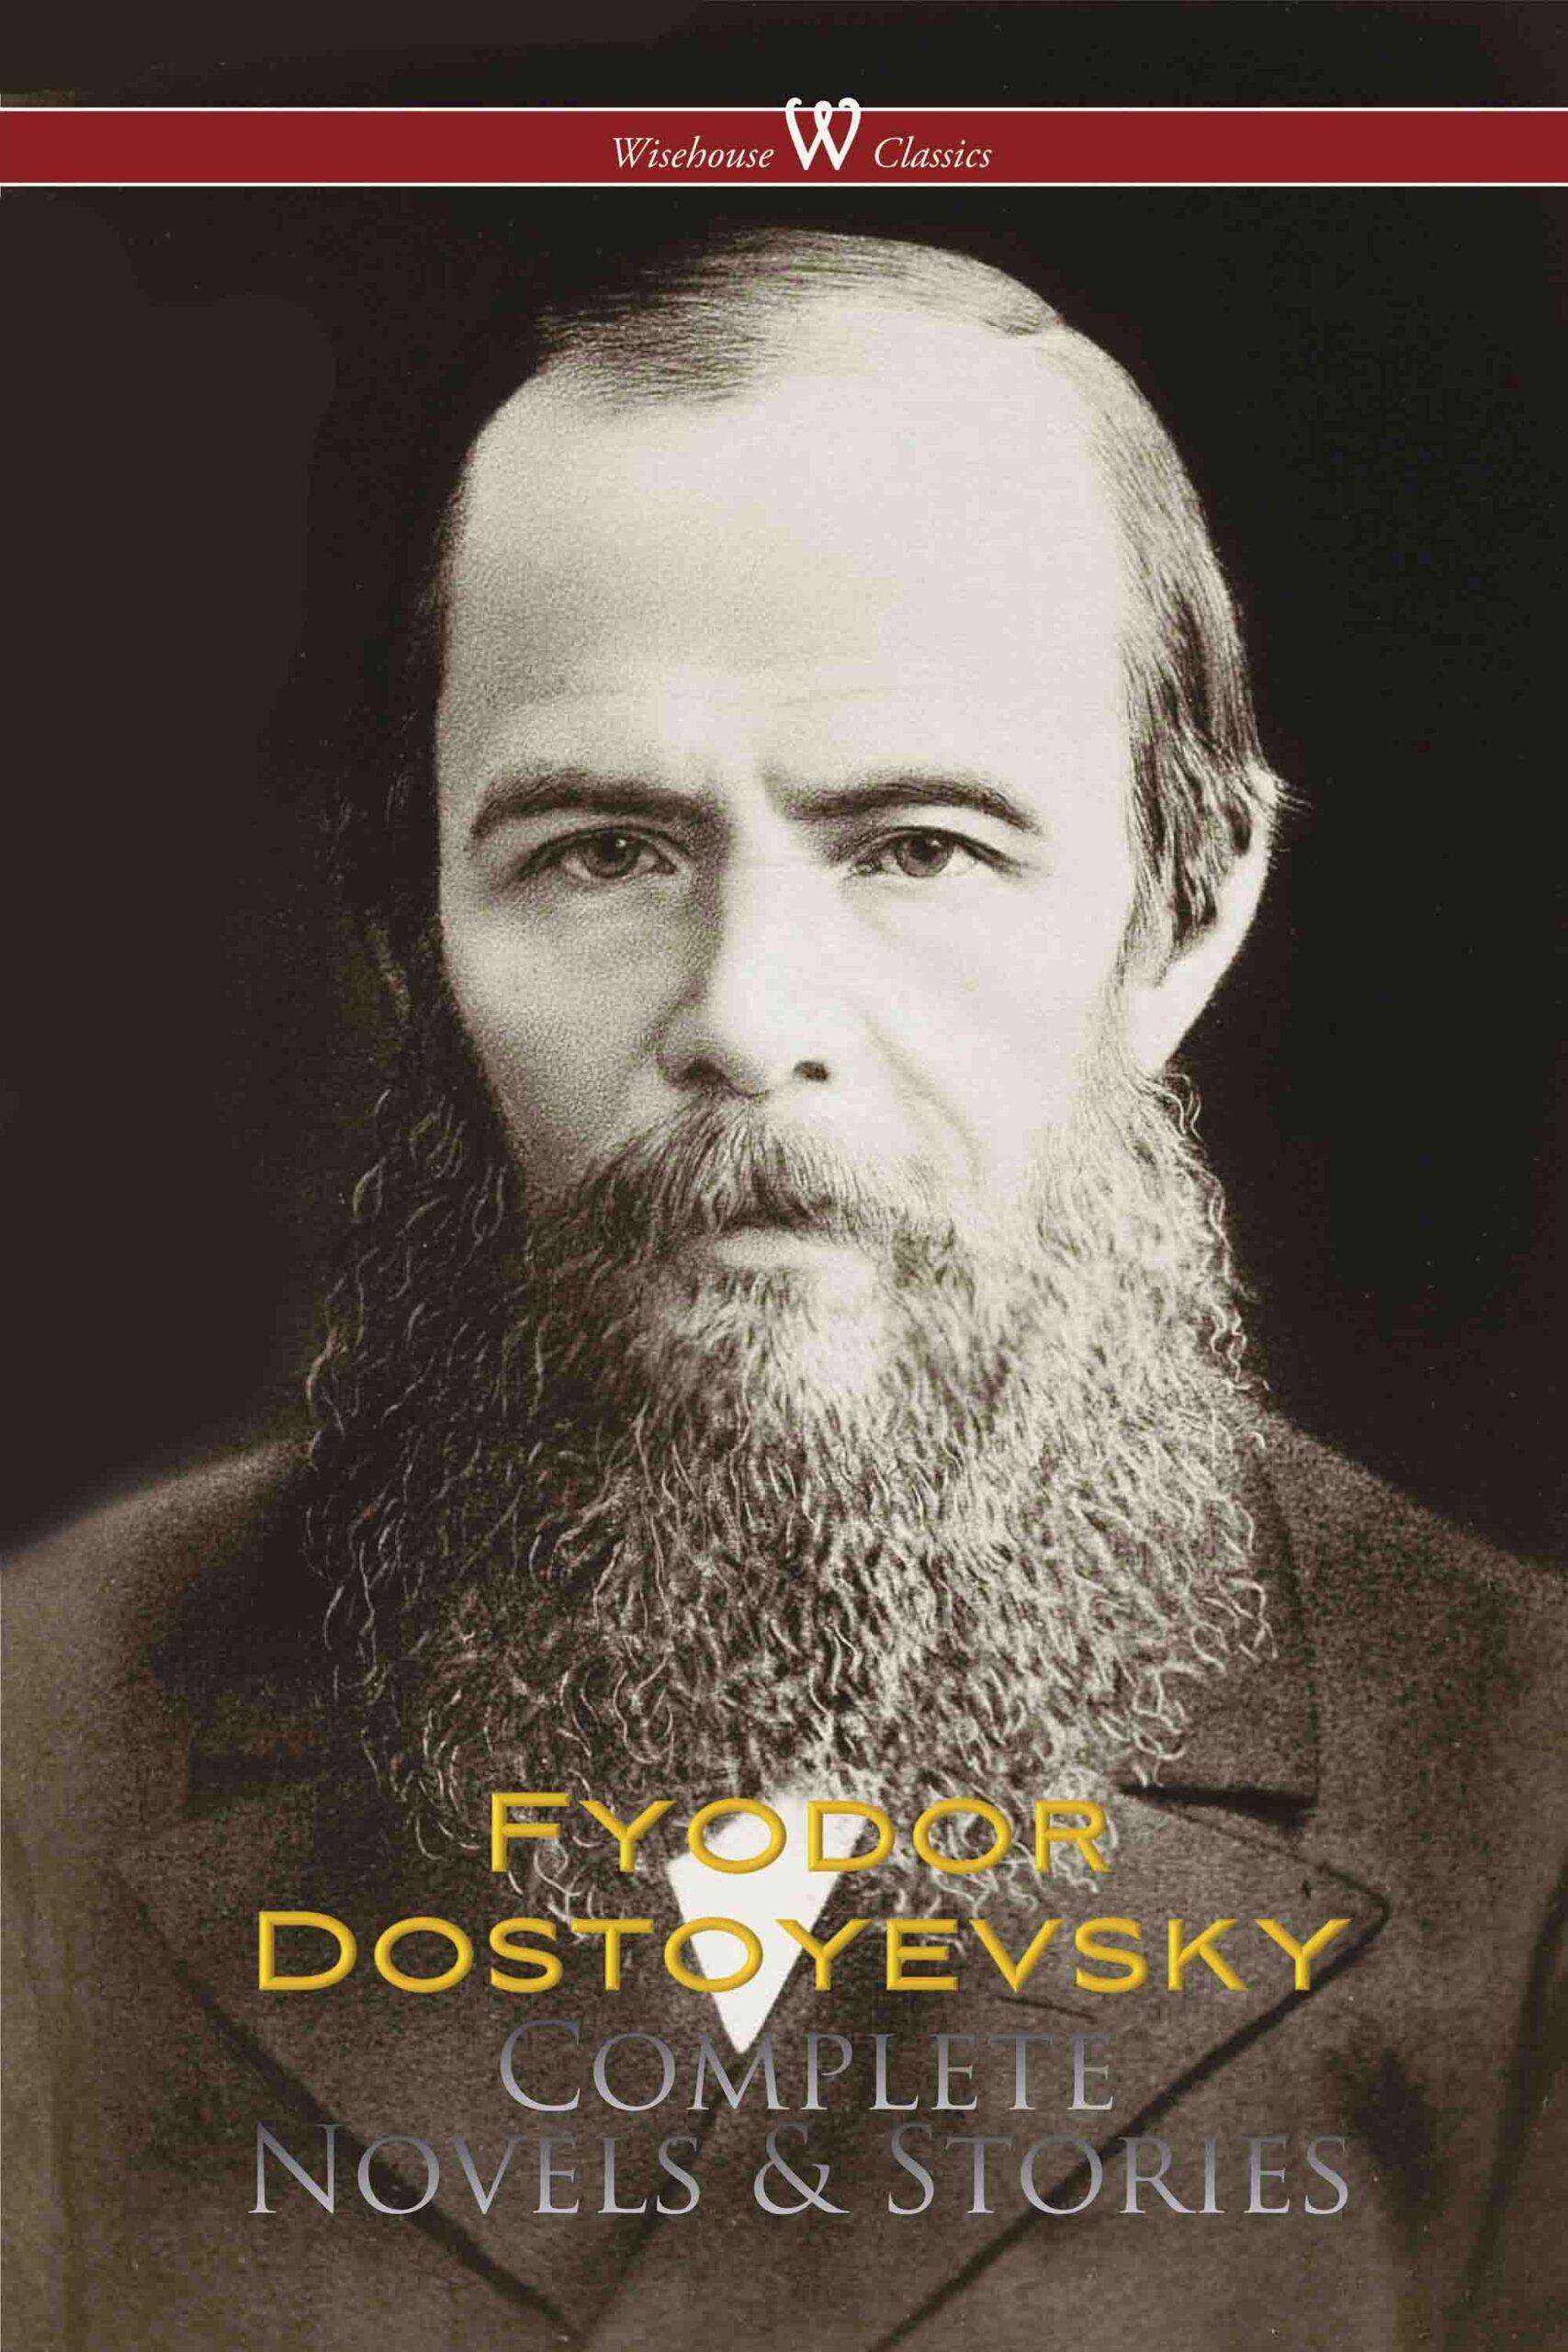 Fyodor Dostoyevsky: Complete Works (Wisehouse Classics)